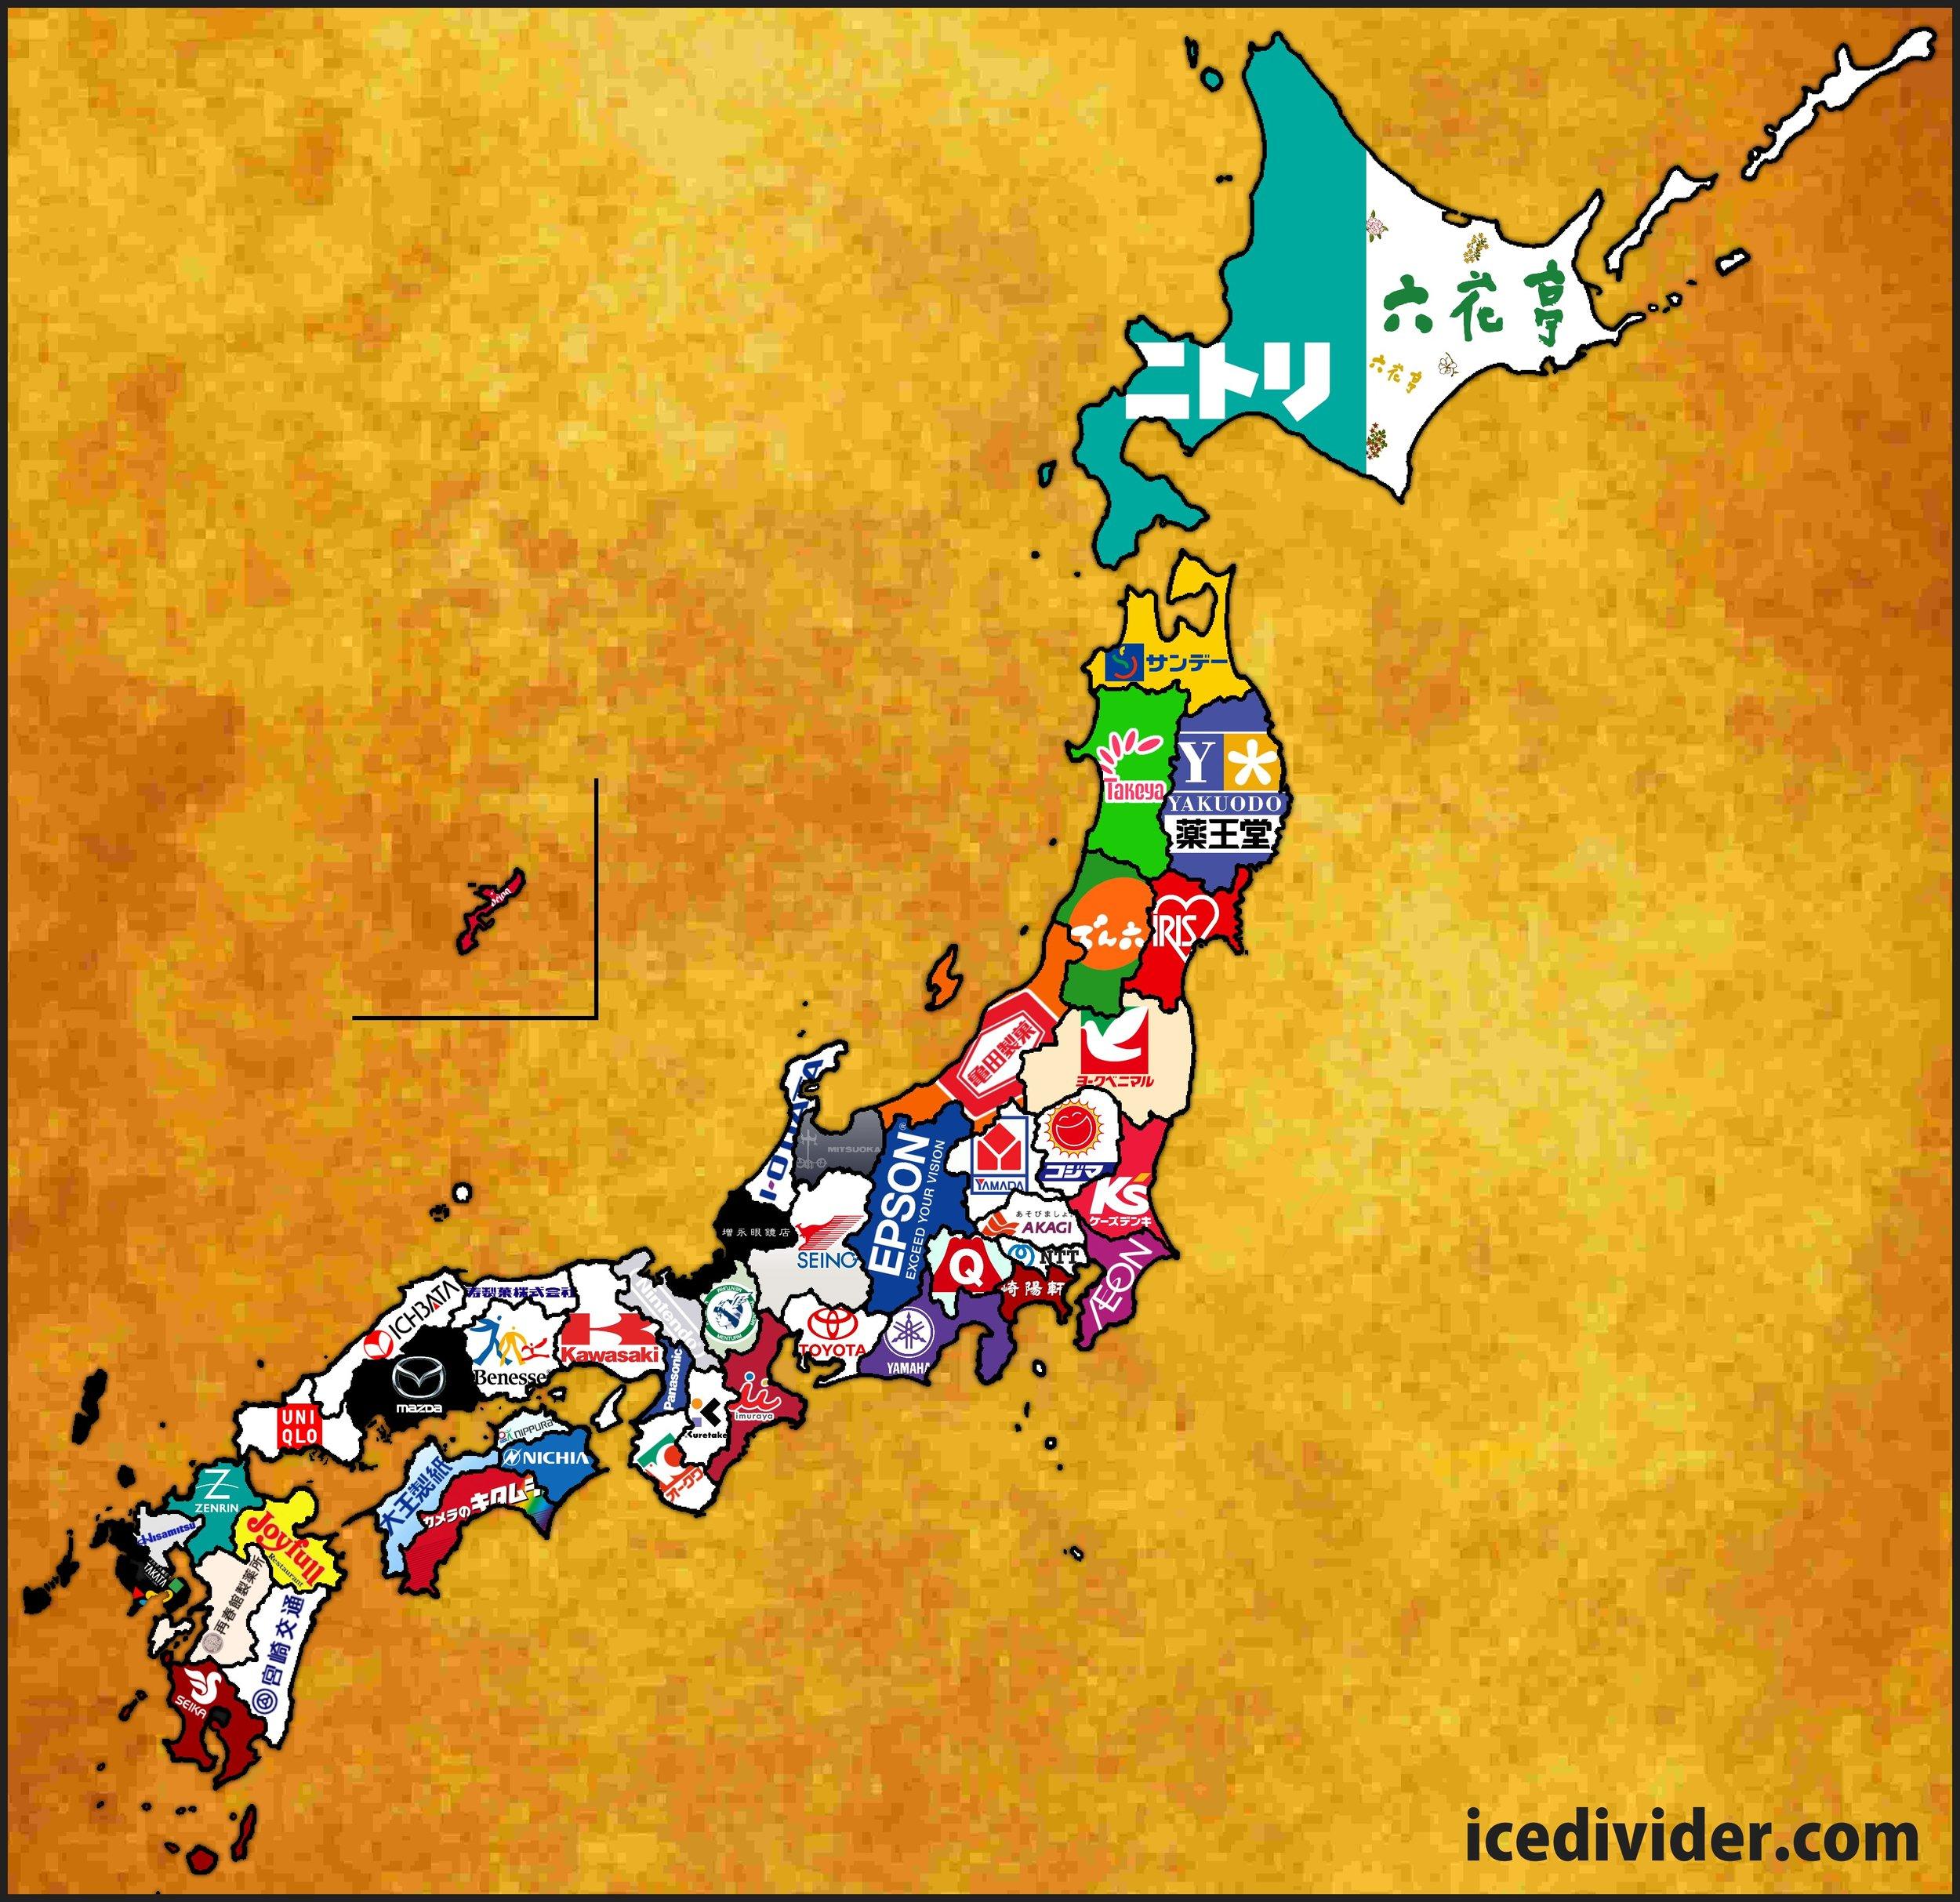 inc_map_of_japan.jpg